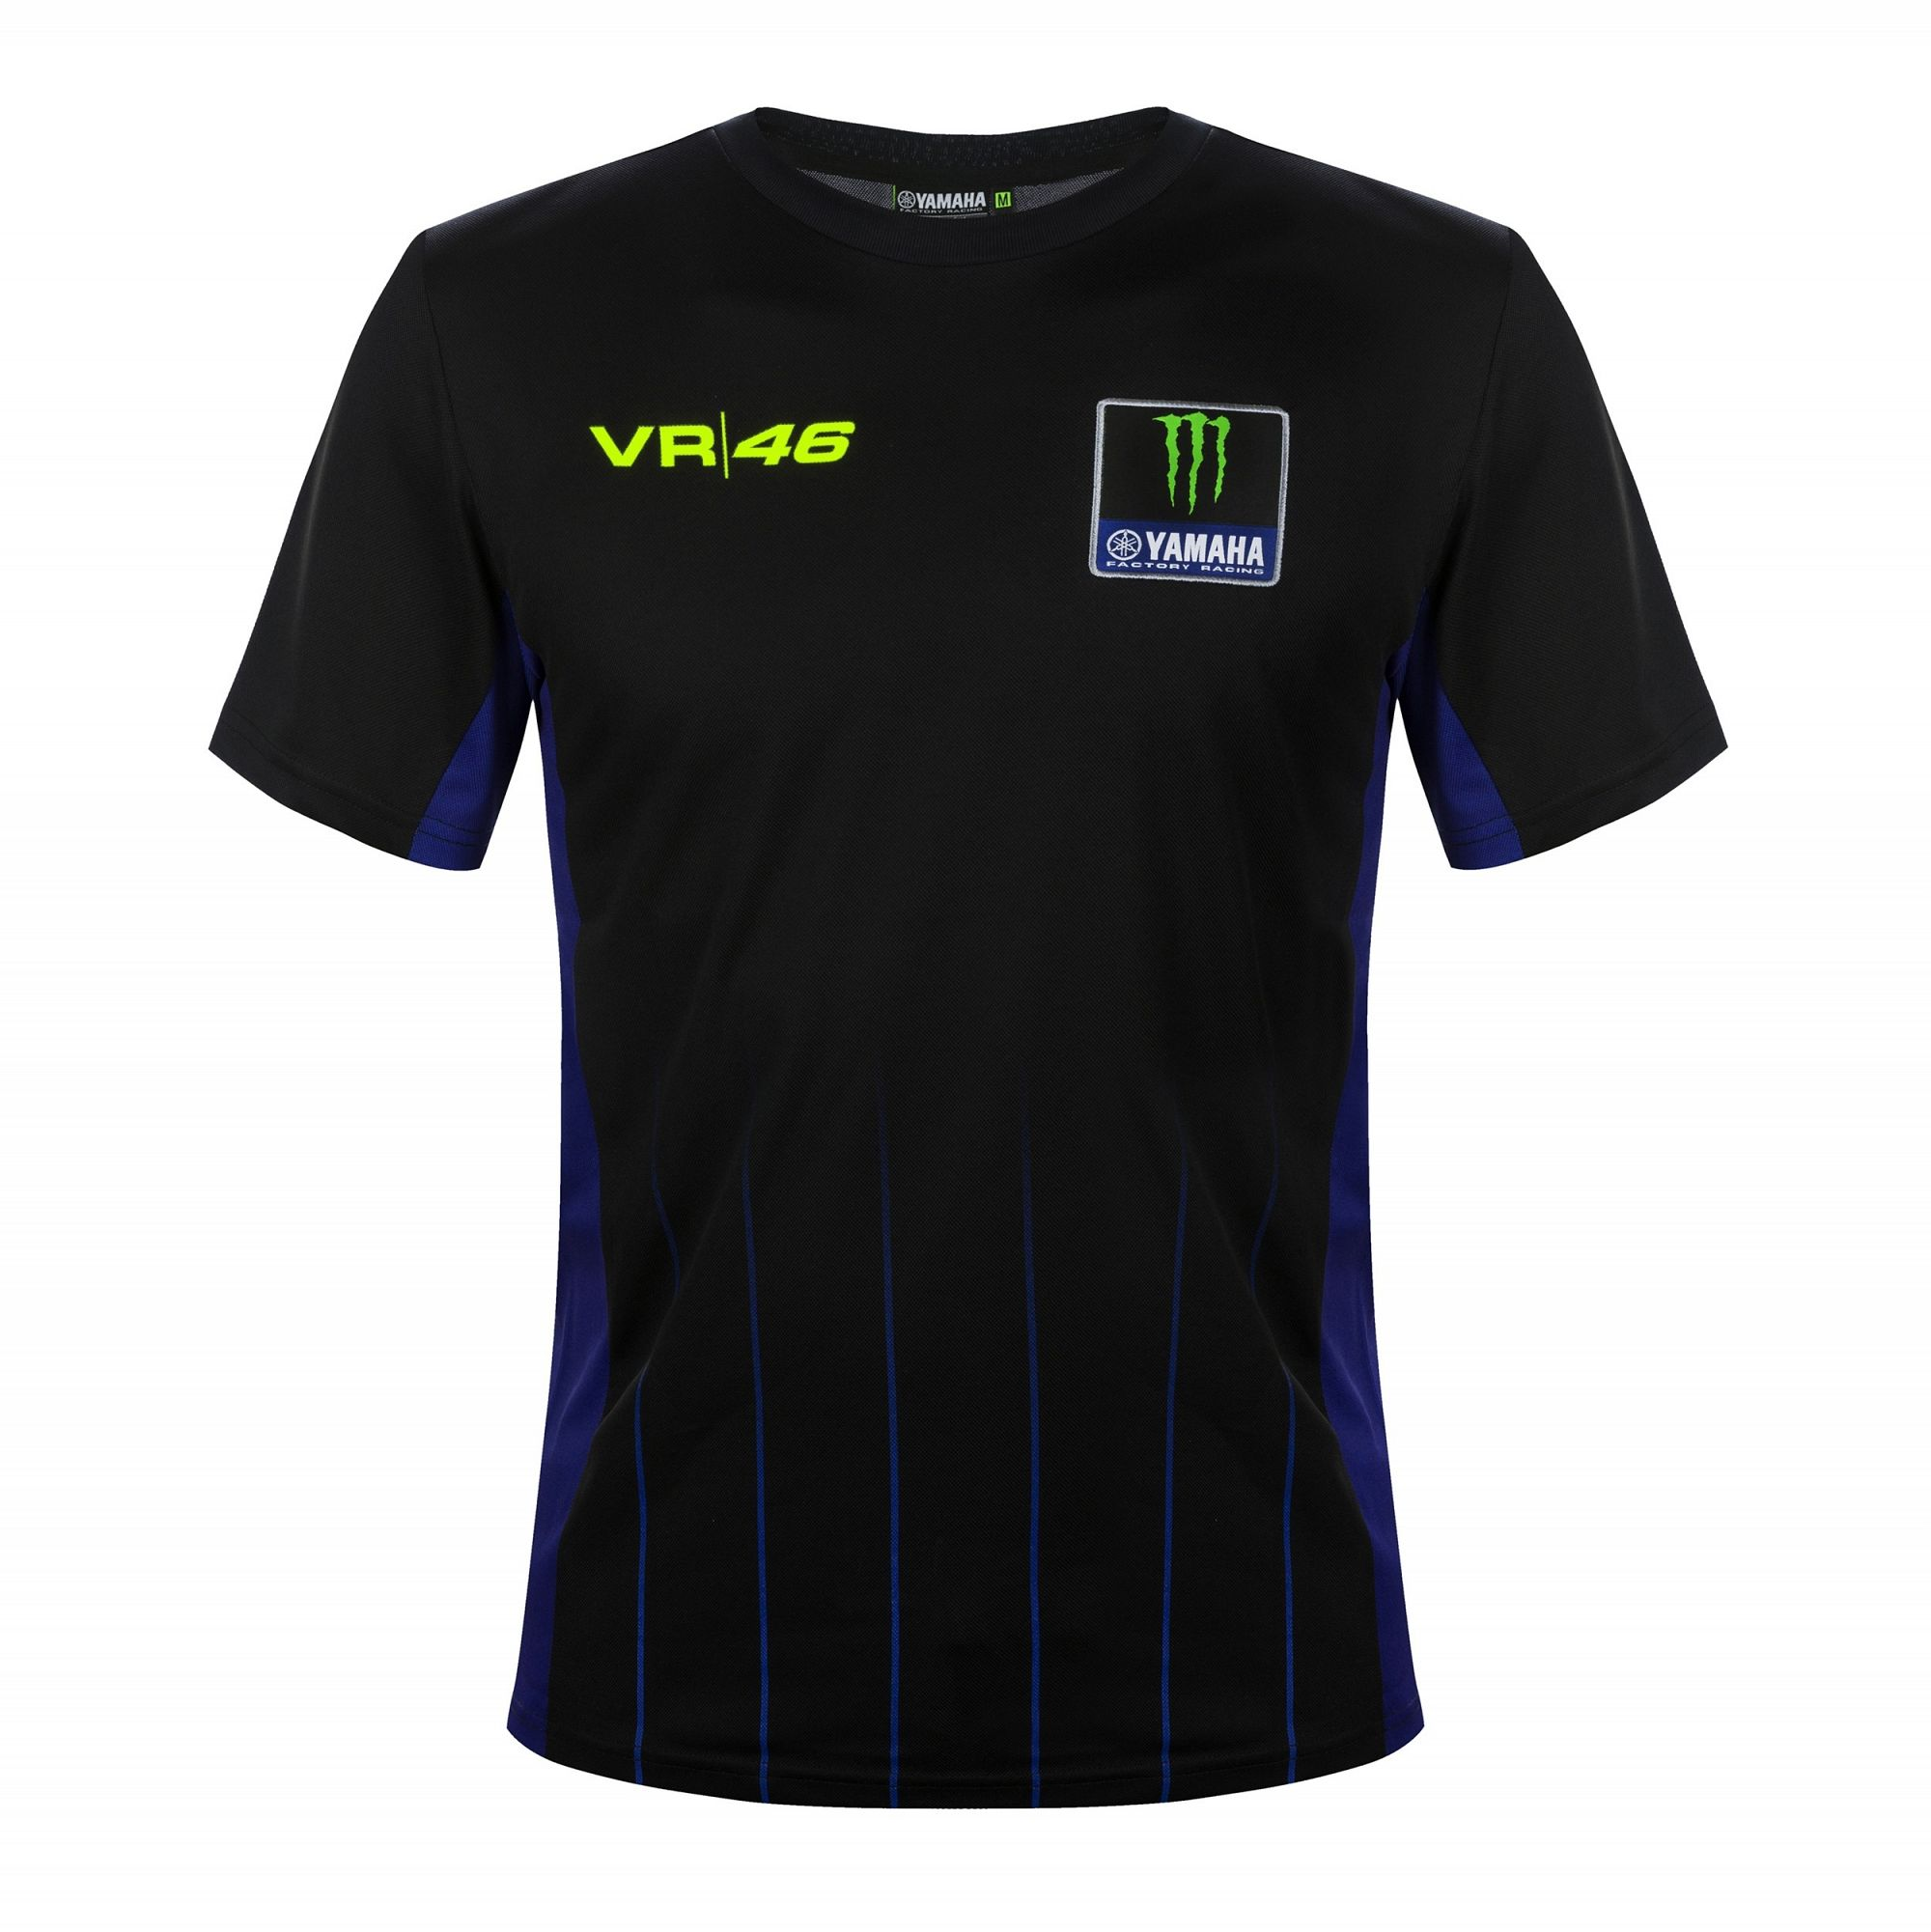 Yamaha VR46 Rossi Mens Black T-Shirt